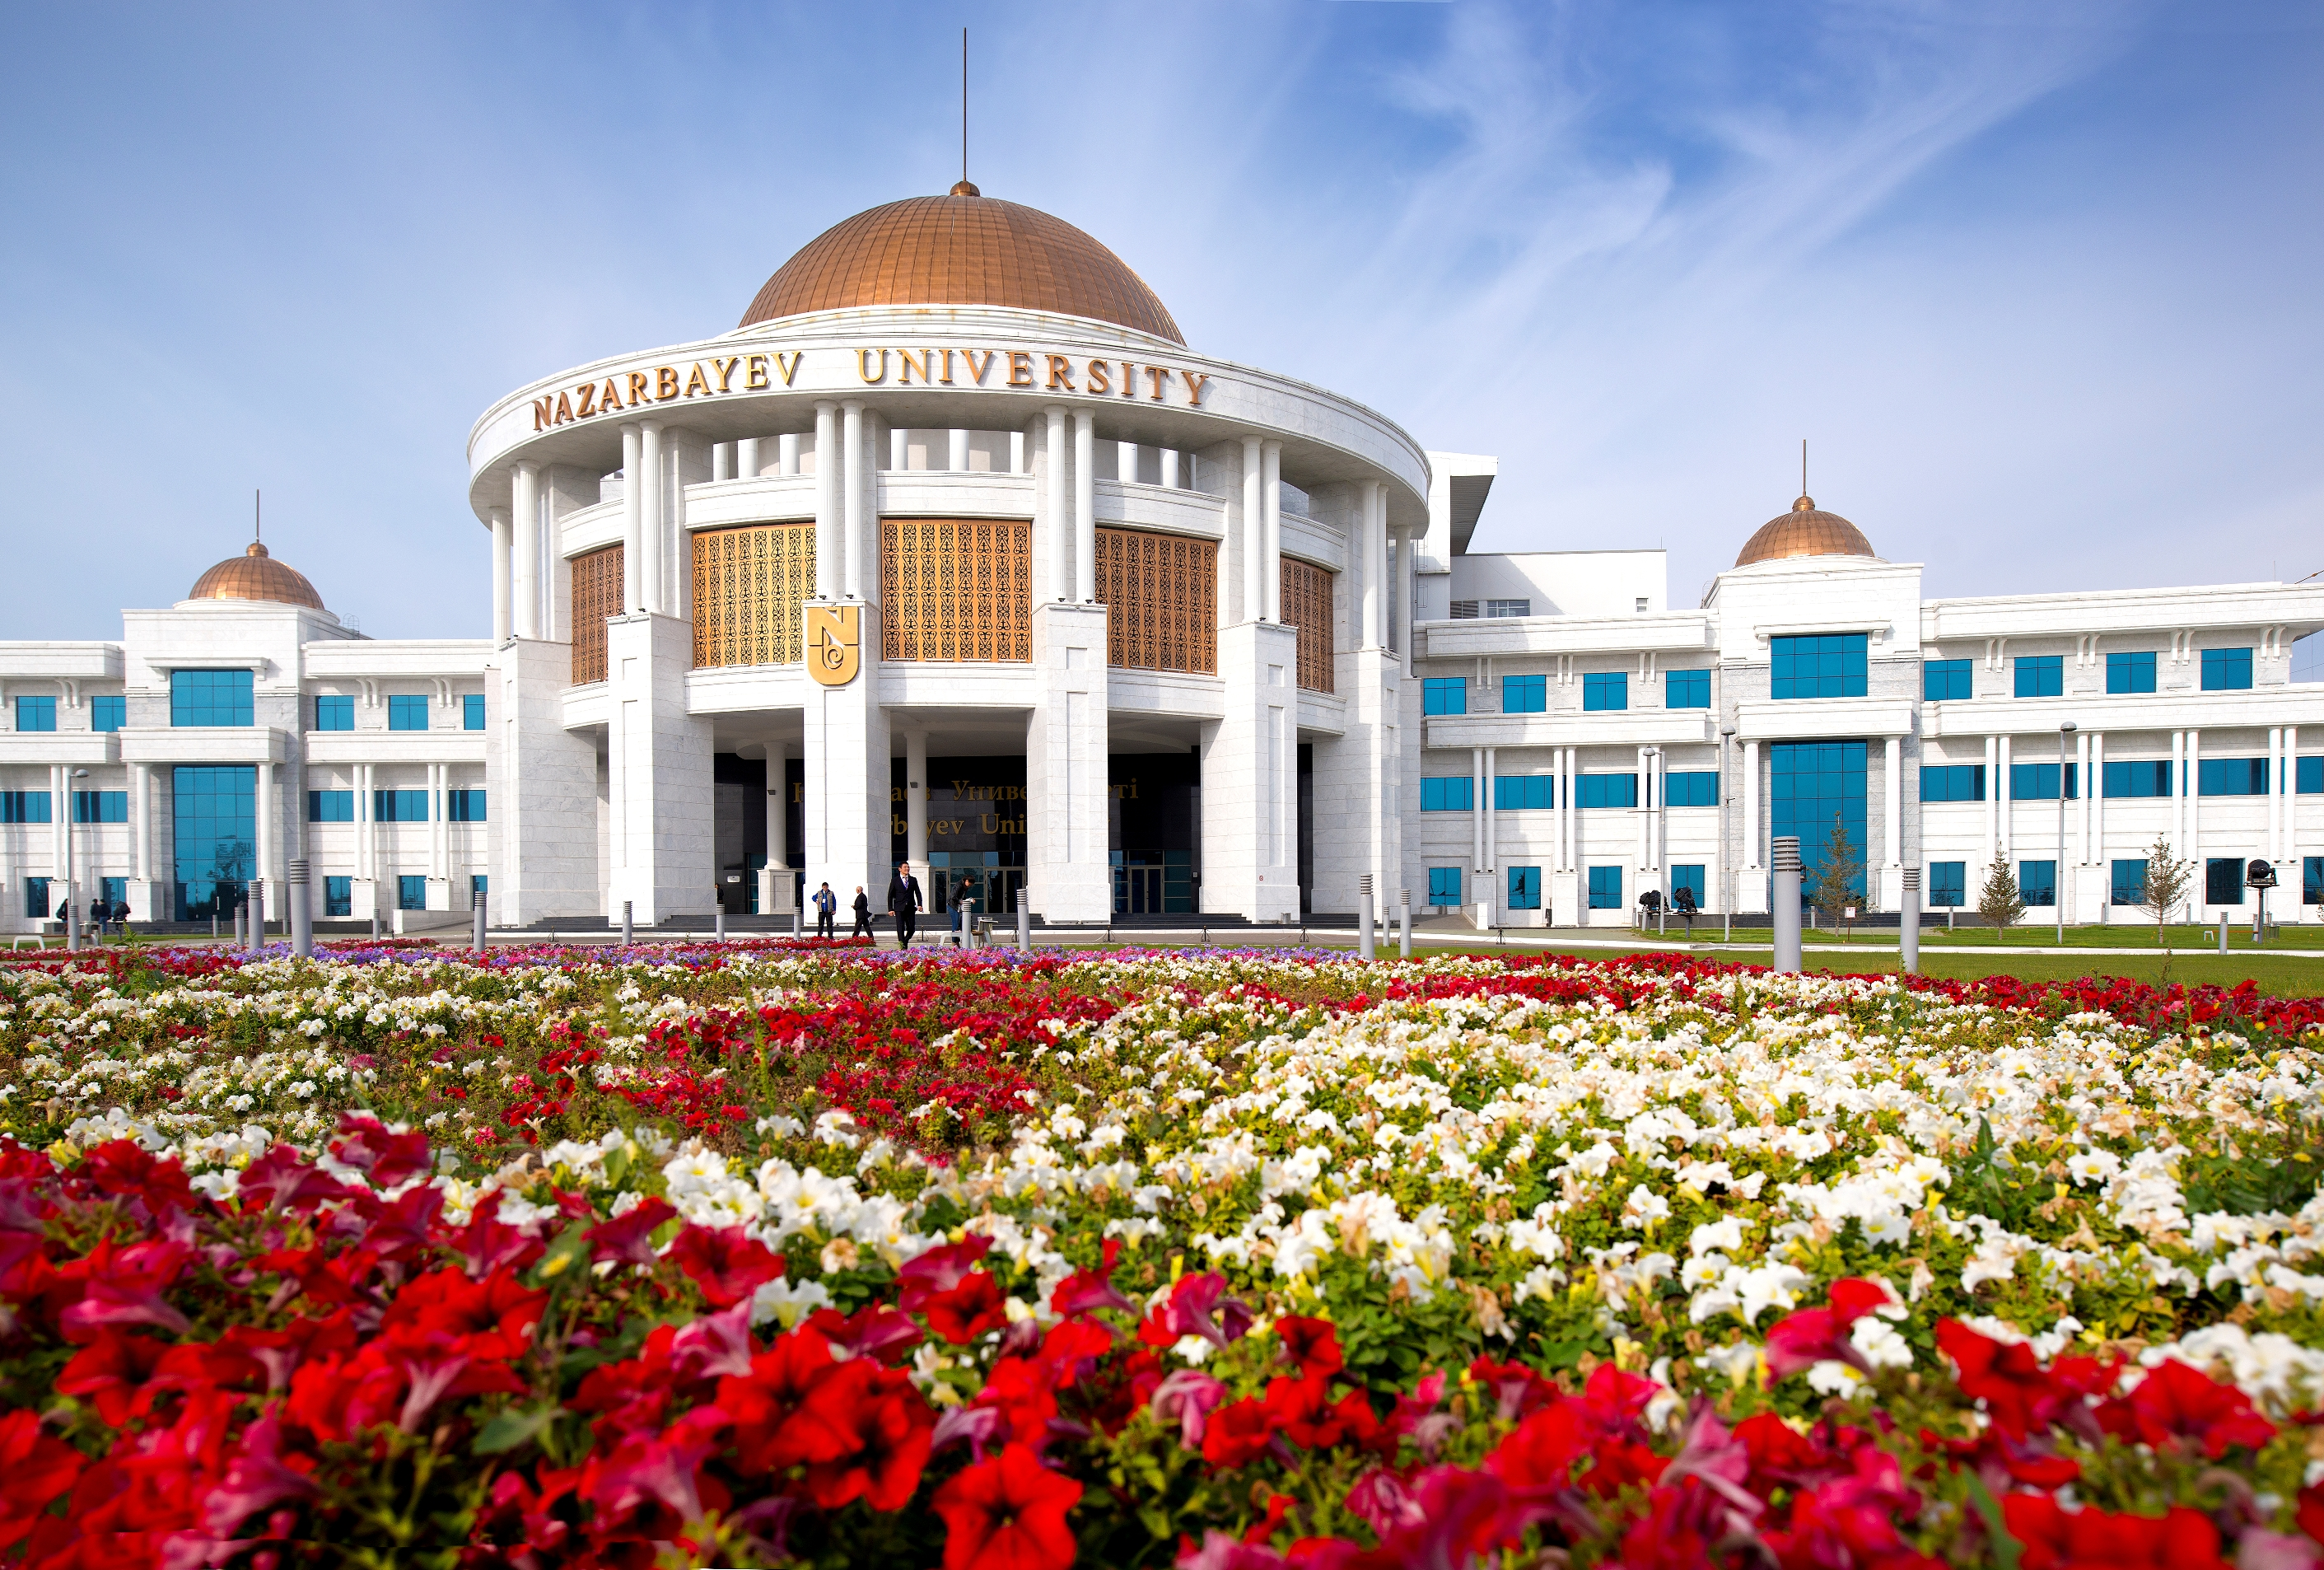 картинки университет казахстана обои